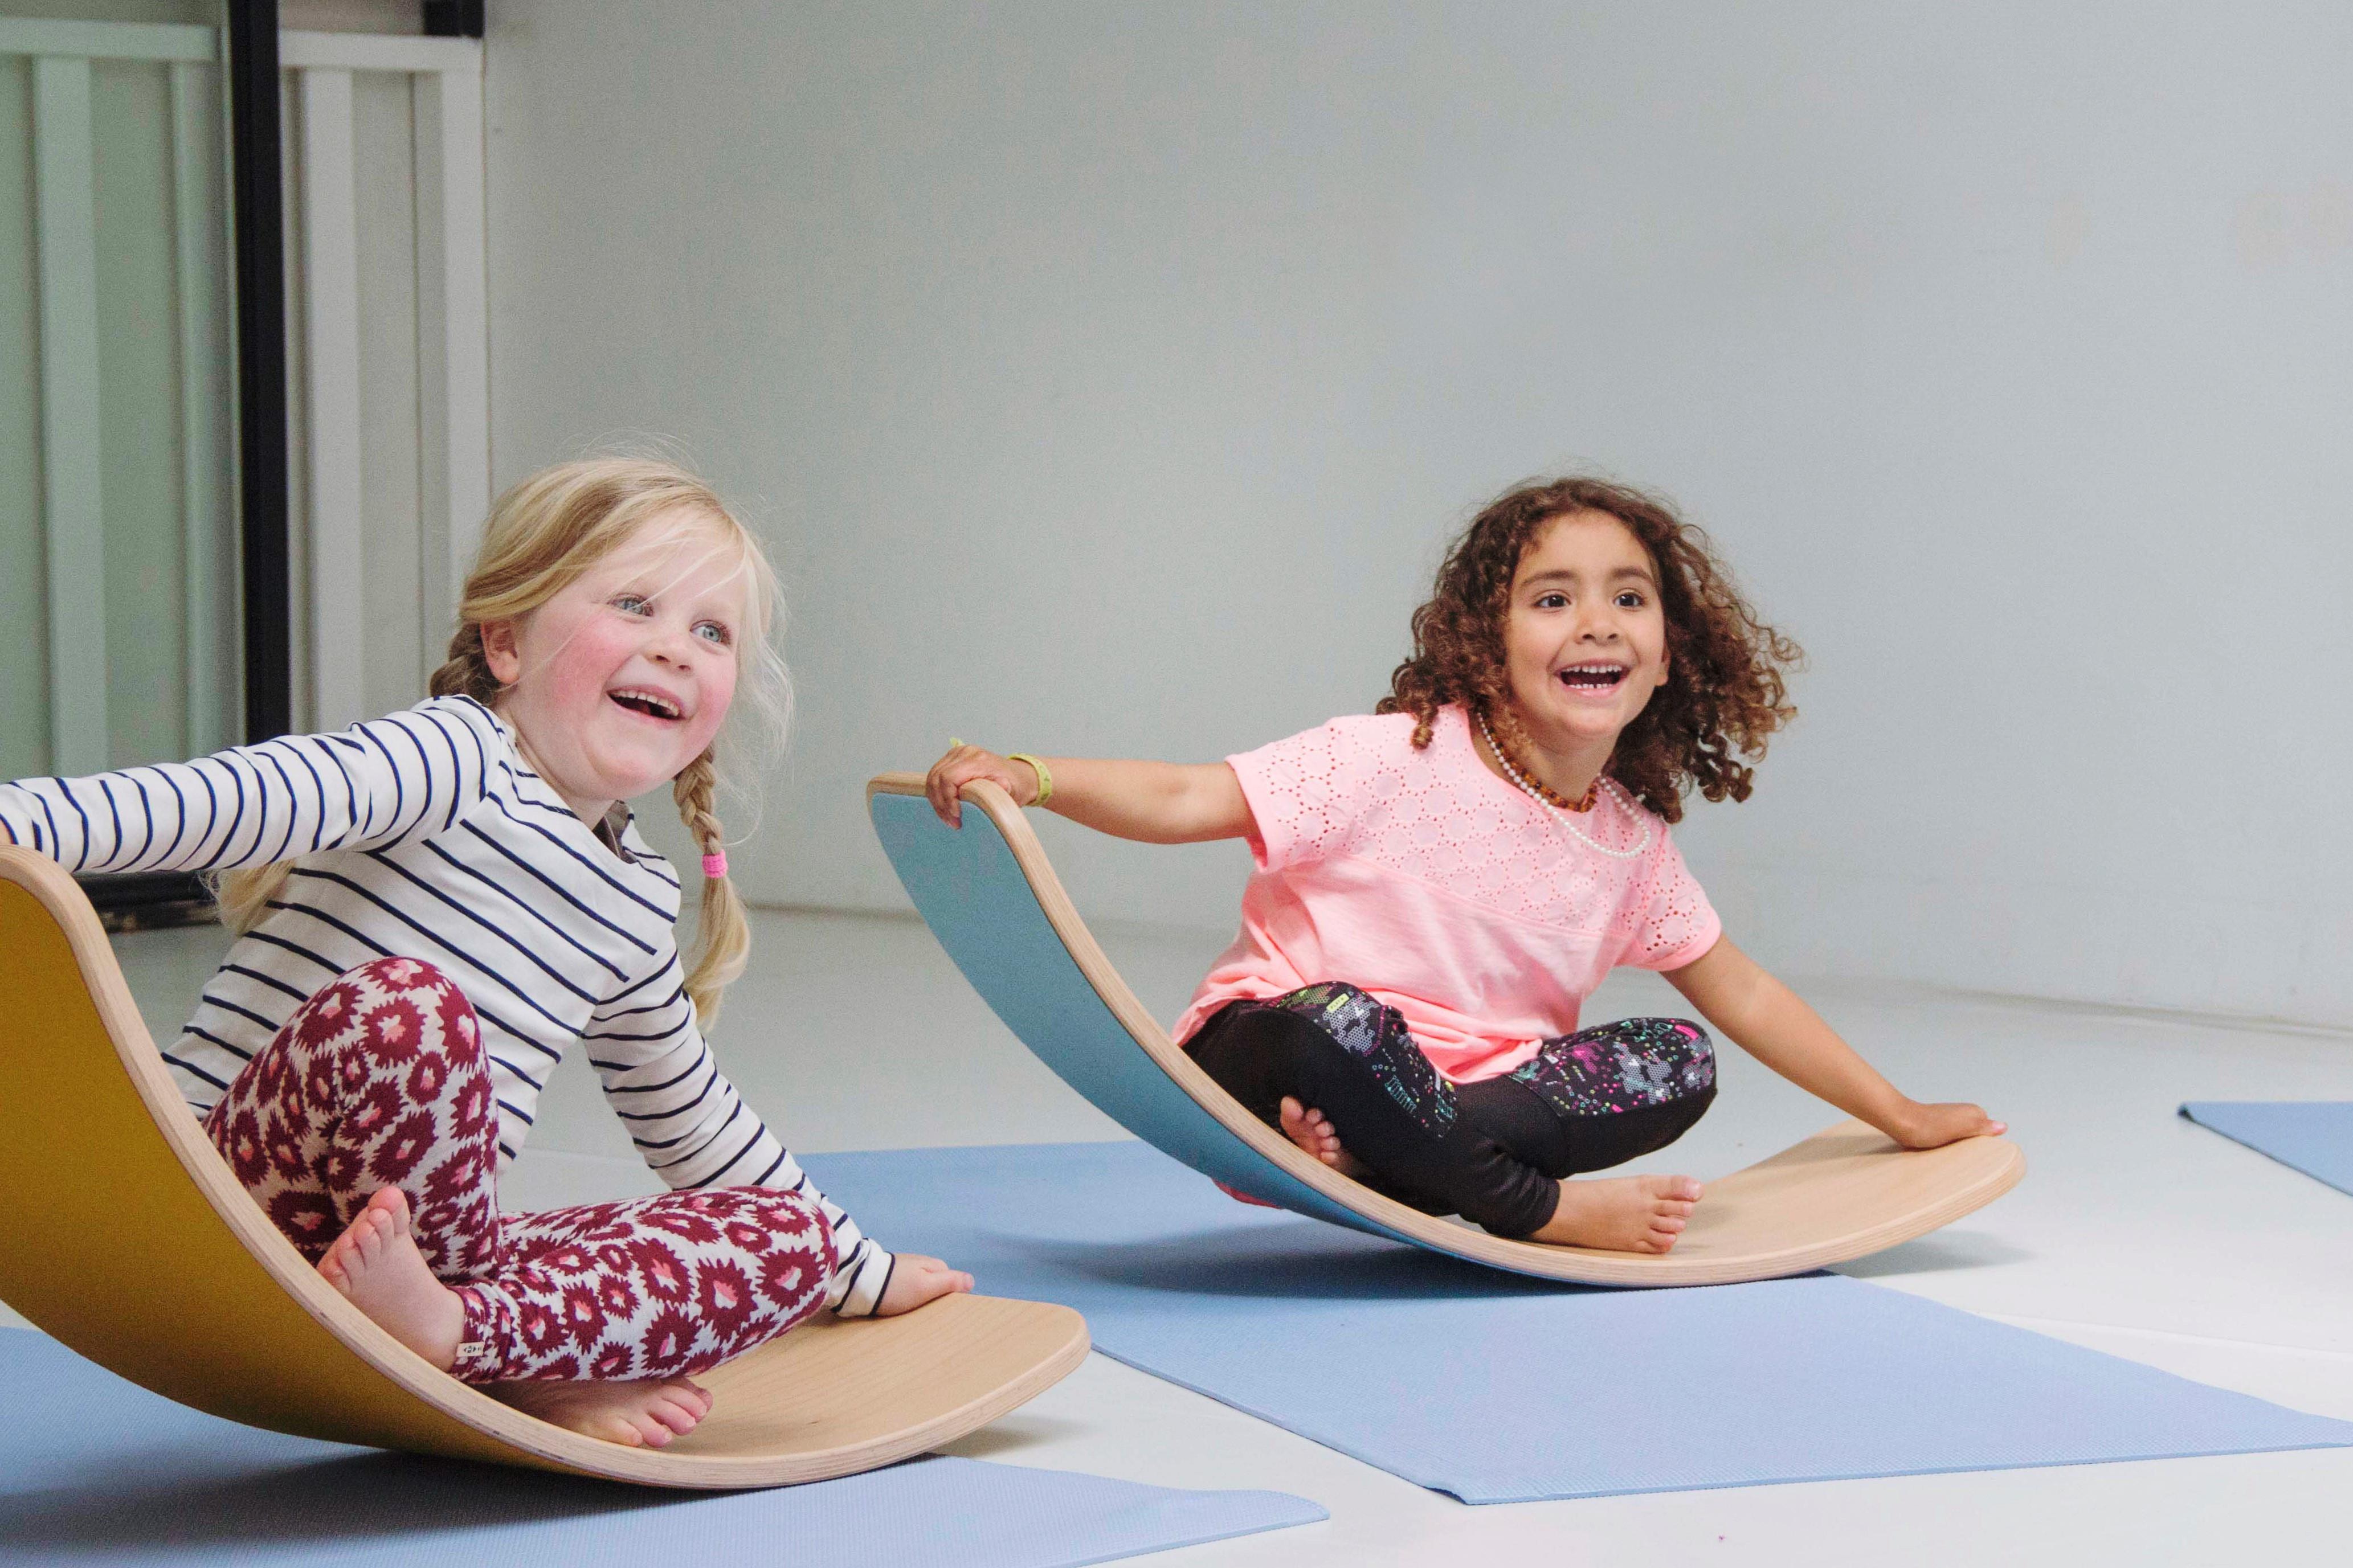 Children's Wobbel Yoga - Bring a Friend